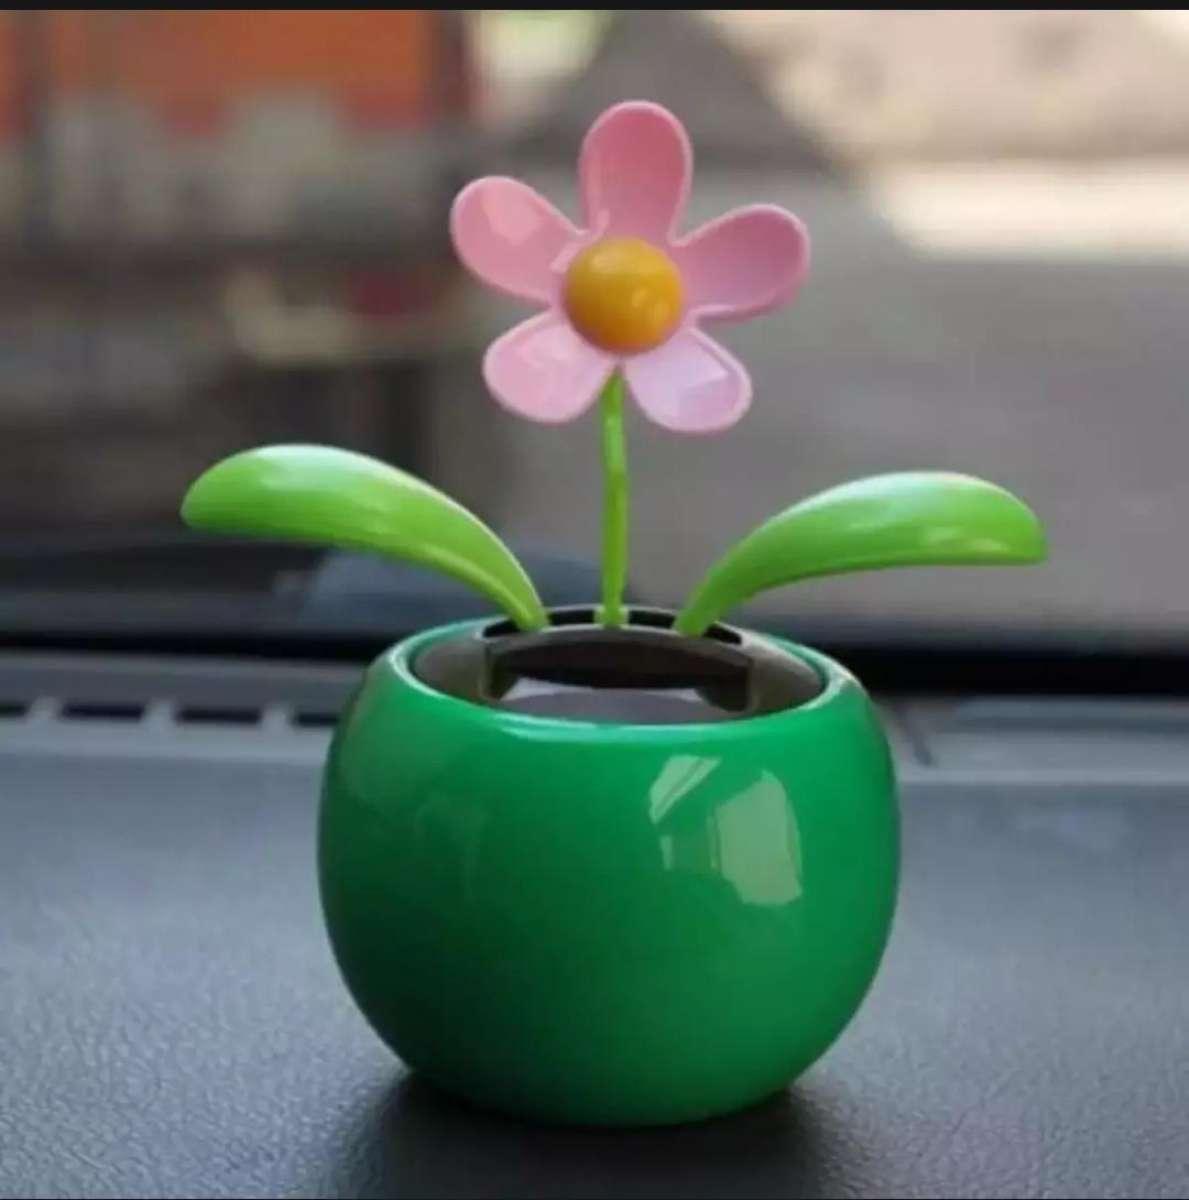 Premium Quality Car Decoration Solar Powered Dancing Flower Swinging Animated Dancer Toy For Honda Civic, City, Toyota GLI, Yaris, Wagon R, Alto VXR, Mehran and all Cars Jeep Buses Vans Parrado